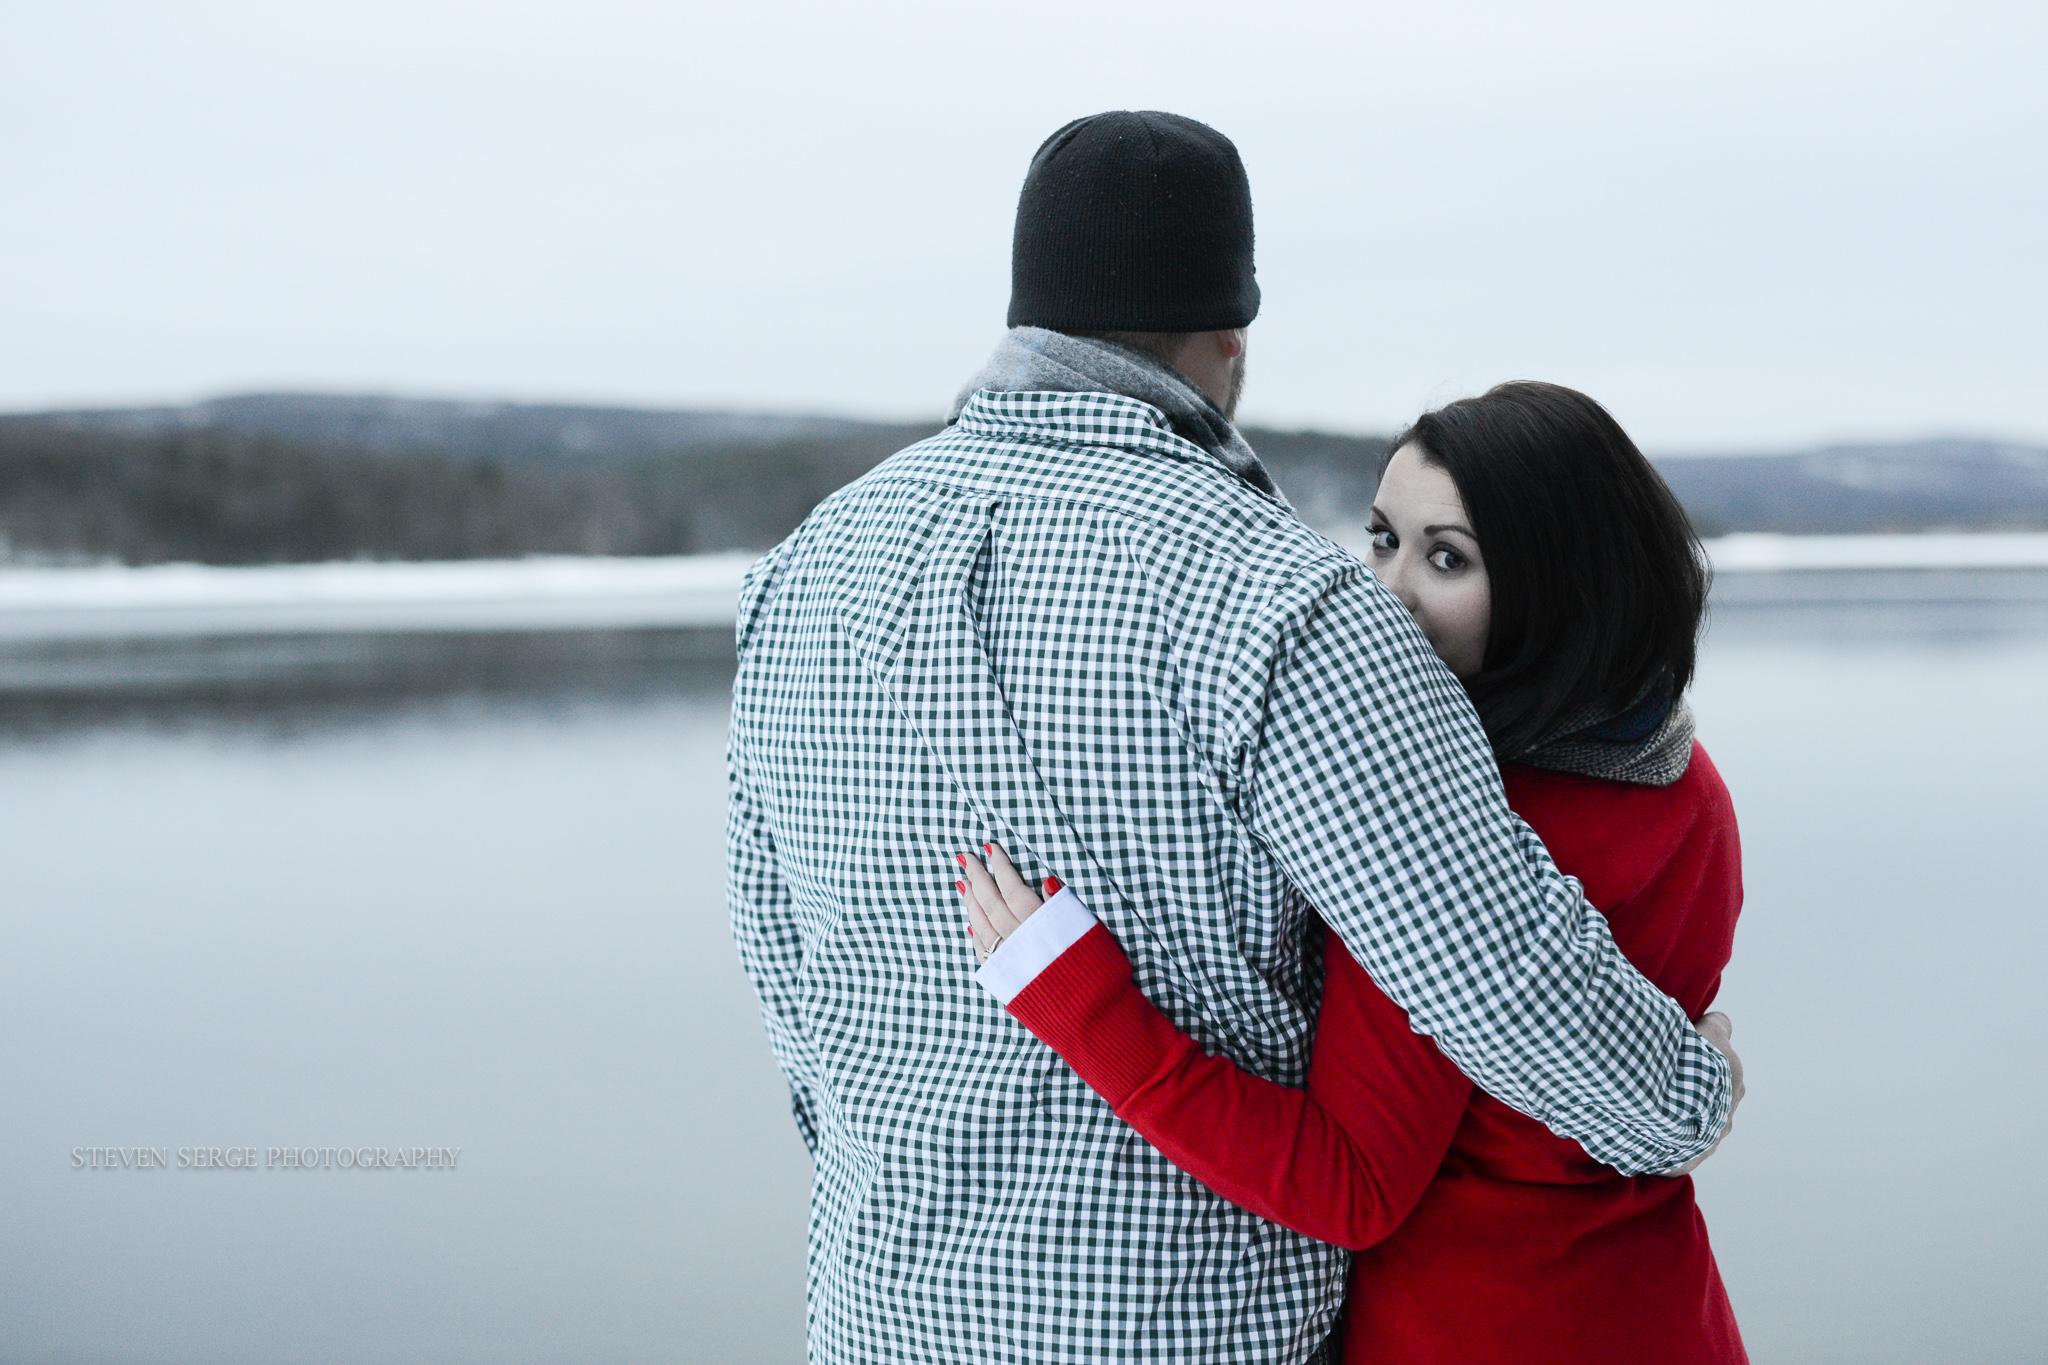 Lindsey-Cultural-Center-Scranton-Engagement-Wedding-Nepa-Photographer-Steamtown-Photography-10.jpg